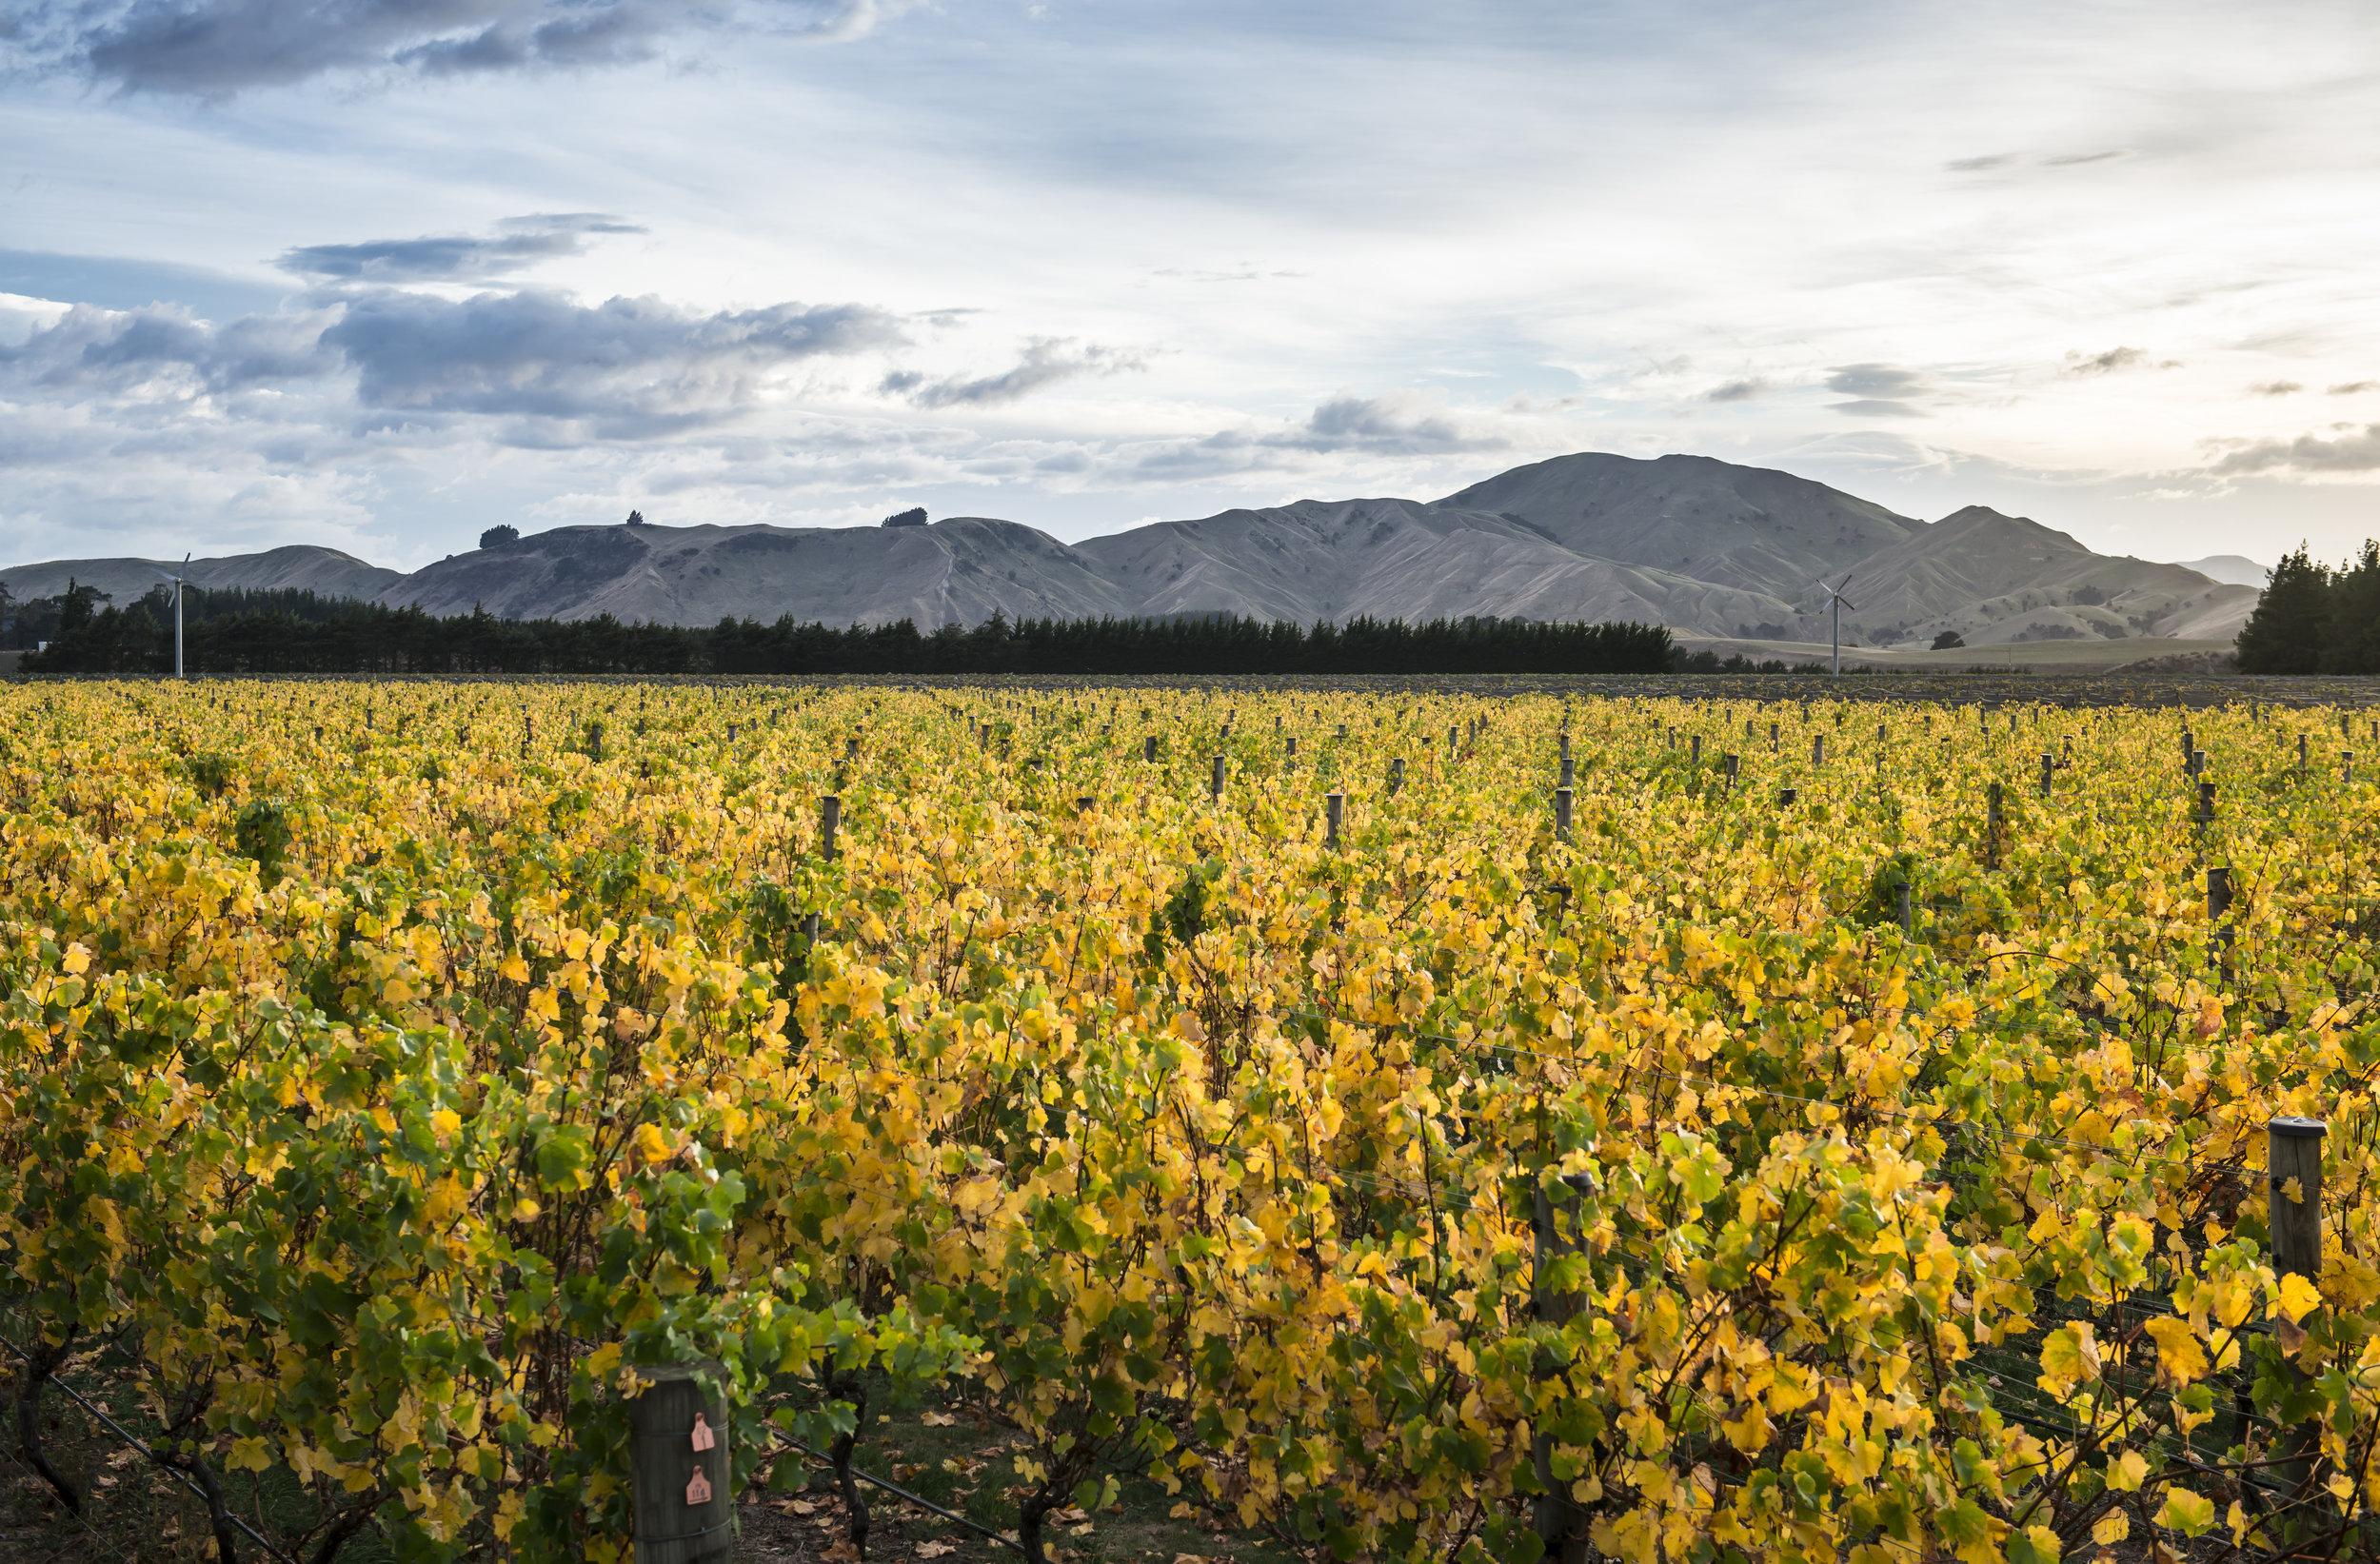 Escarpment Vineyard of New Zealand's Wairarapa wine region (image by New Zealand Wine).